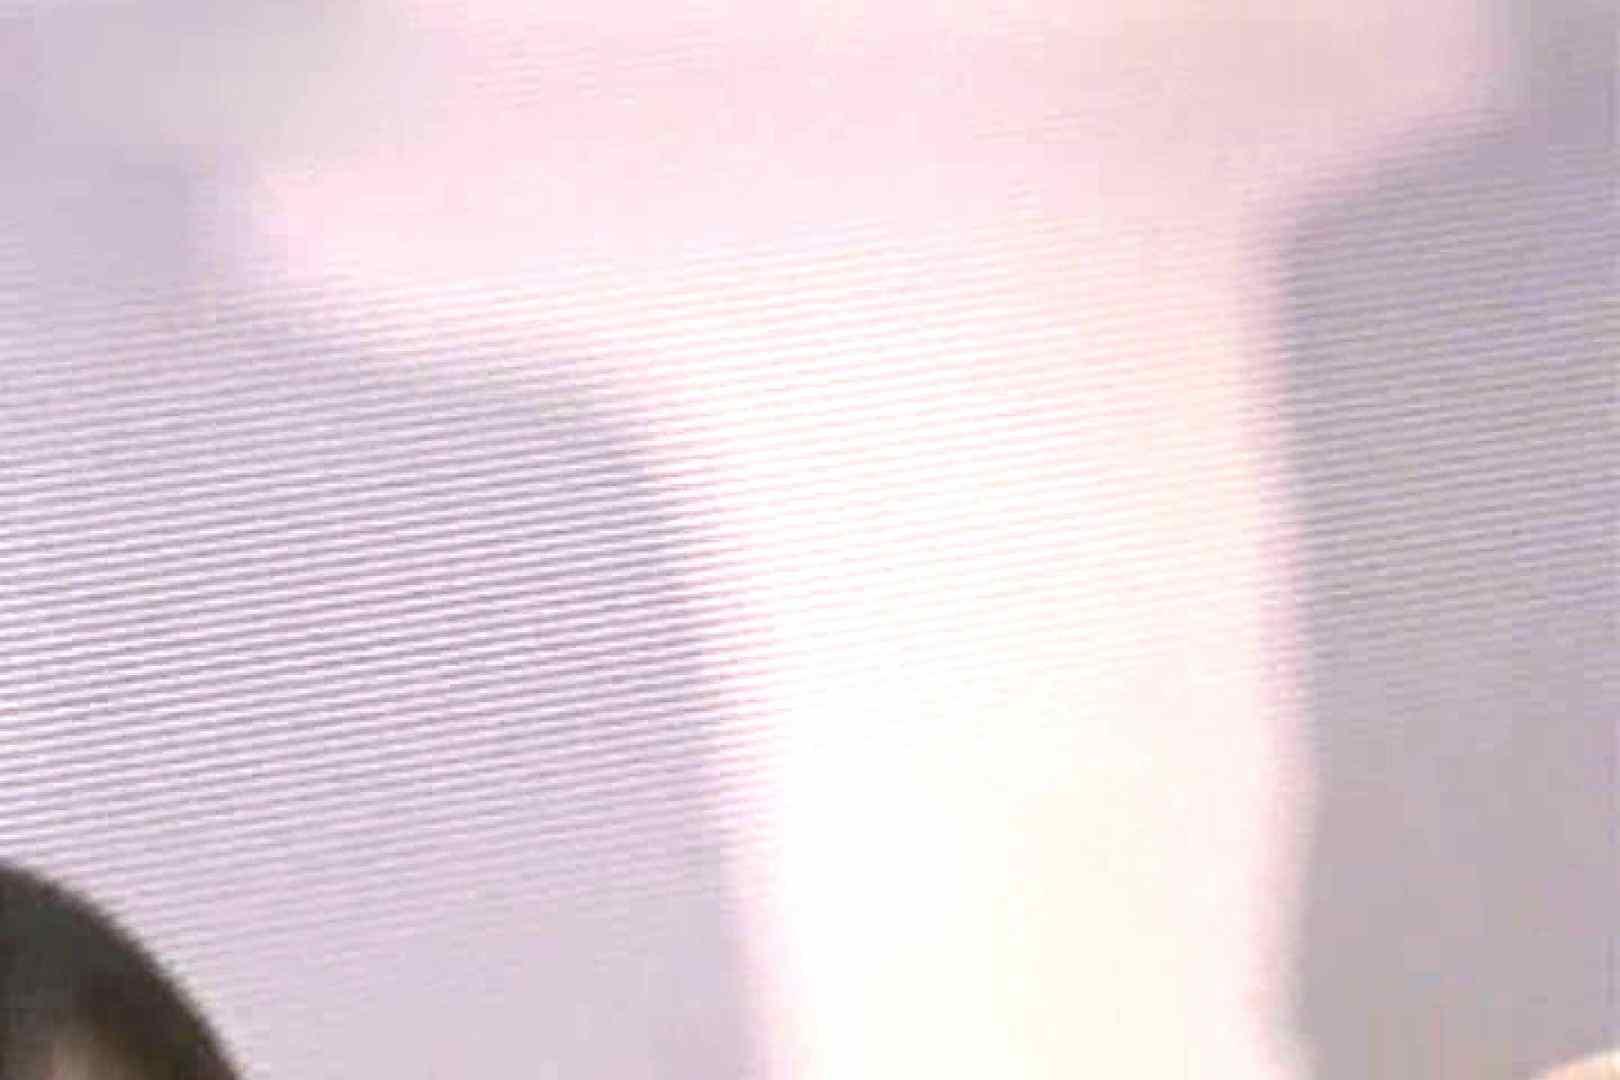 RQカメラ地獄Vol.23 勃起 オマンコ動画キャプチャ 106pic 61